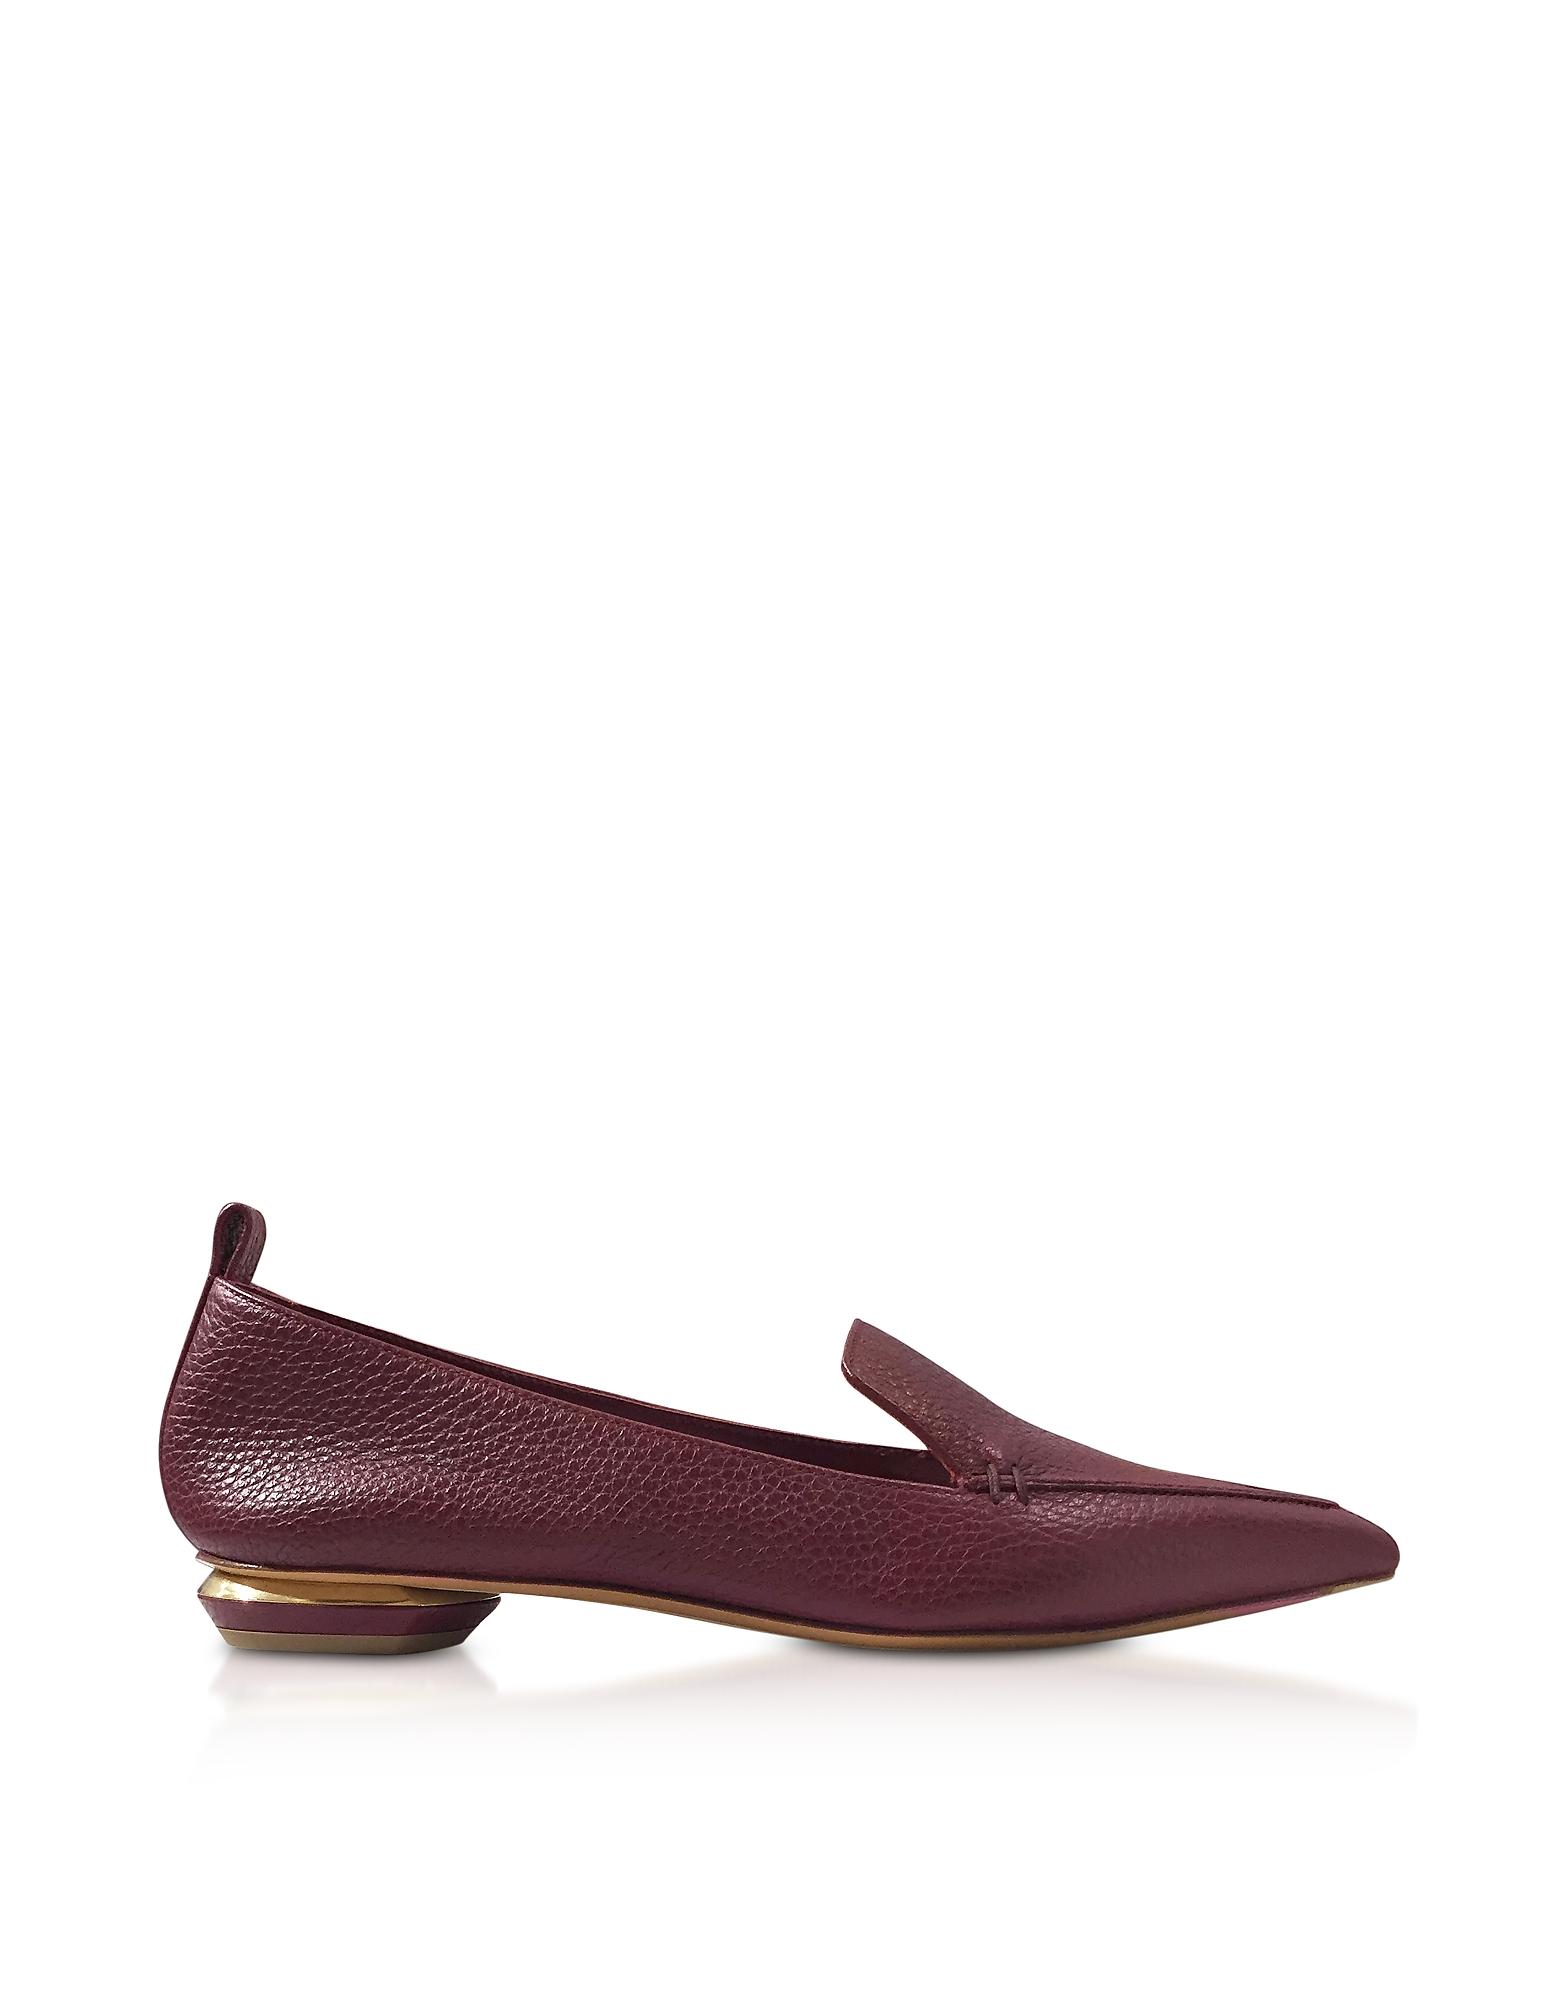 Image of Nicholas Kirkwood Designer Shoes, Beya Burgundy Tumbled Leather Loafers